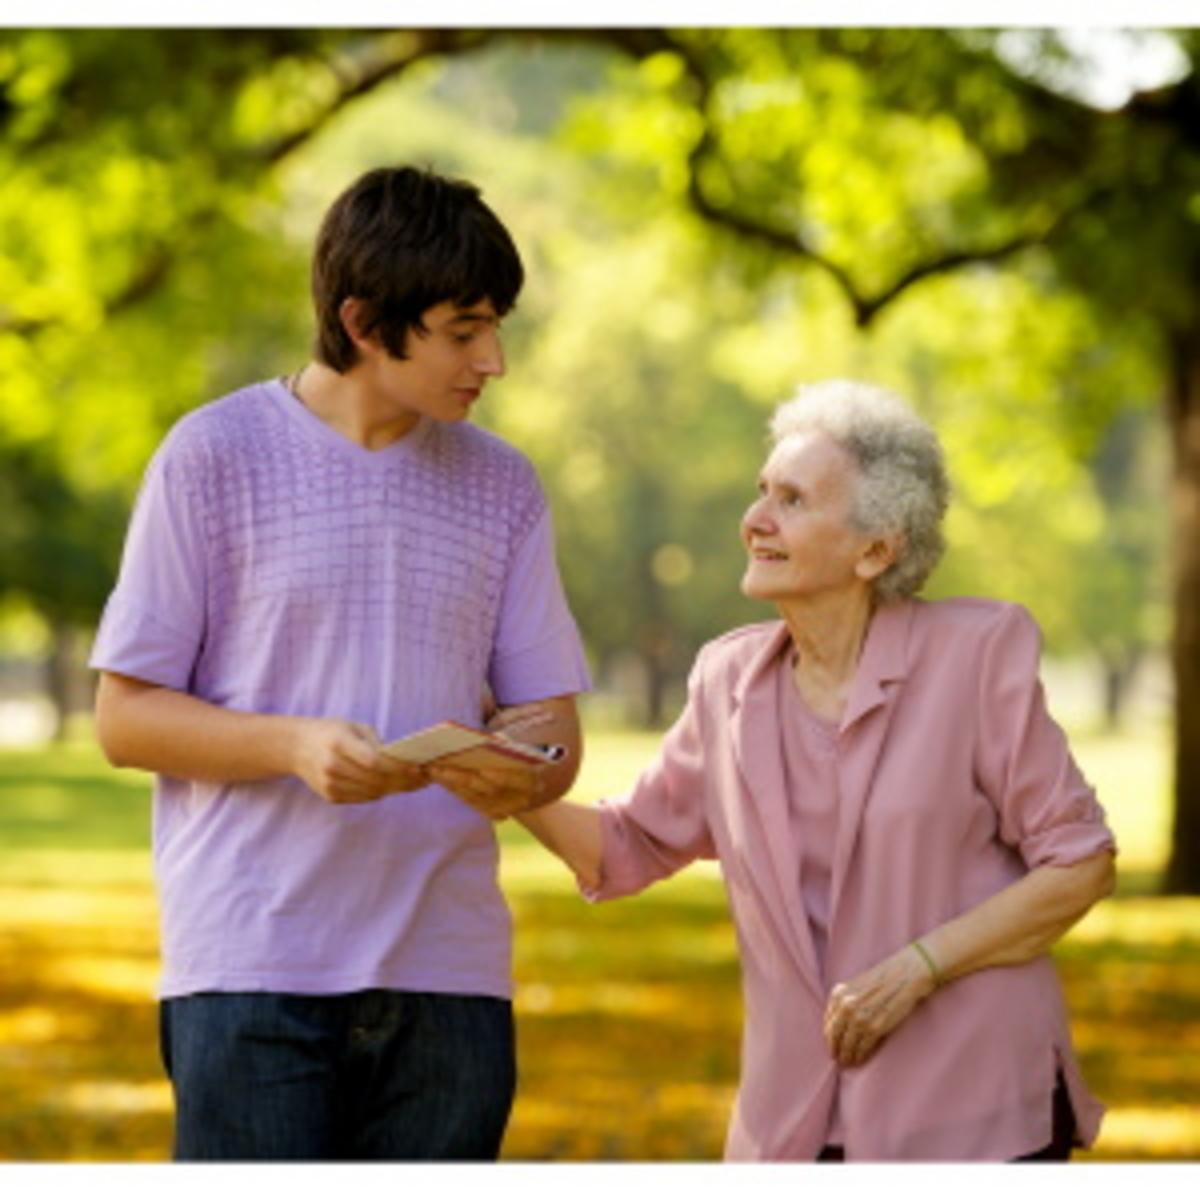 visiting elderly